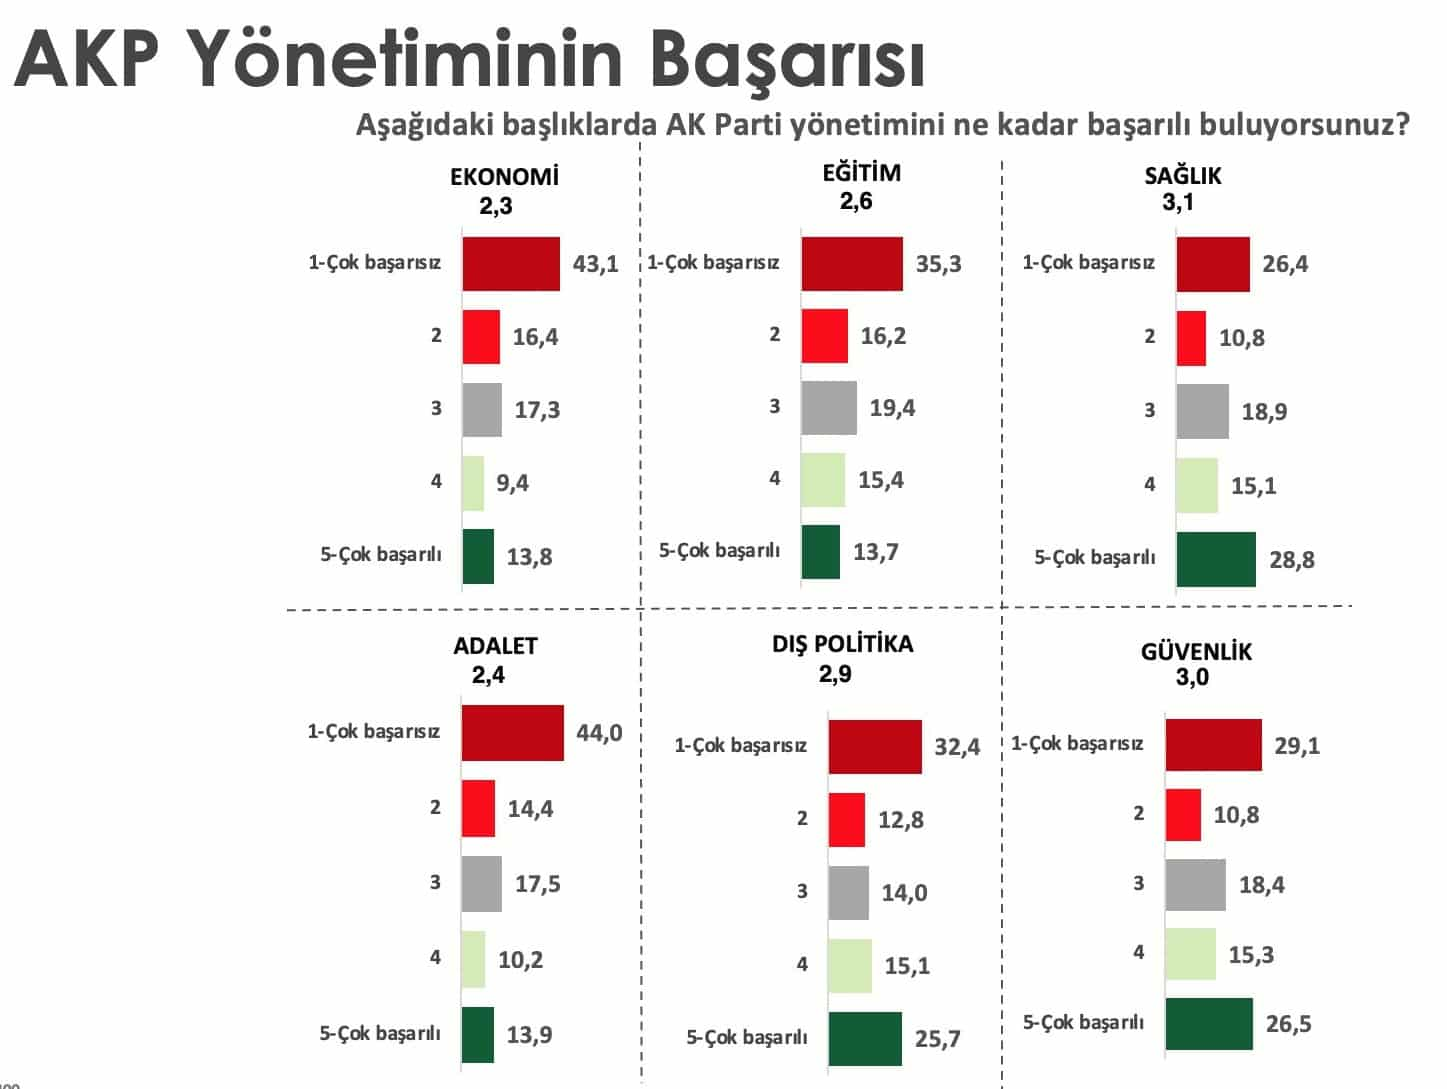 akp performans yönetim anket